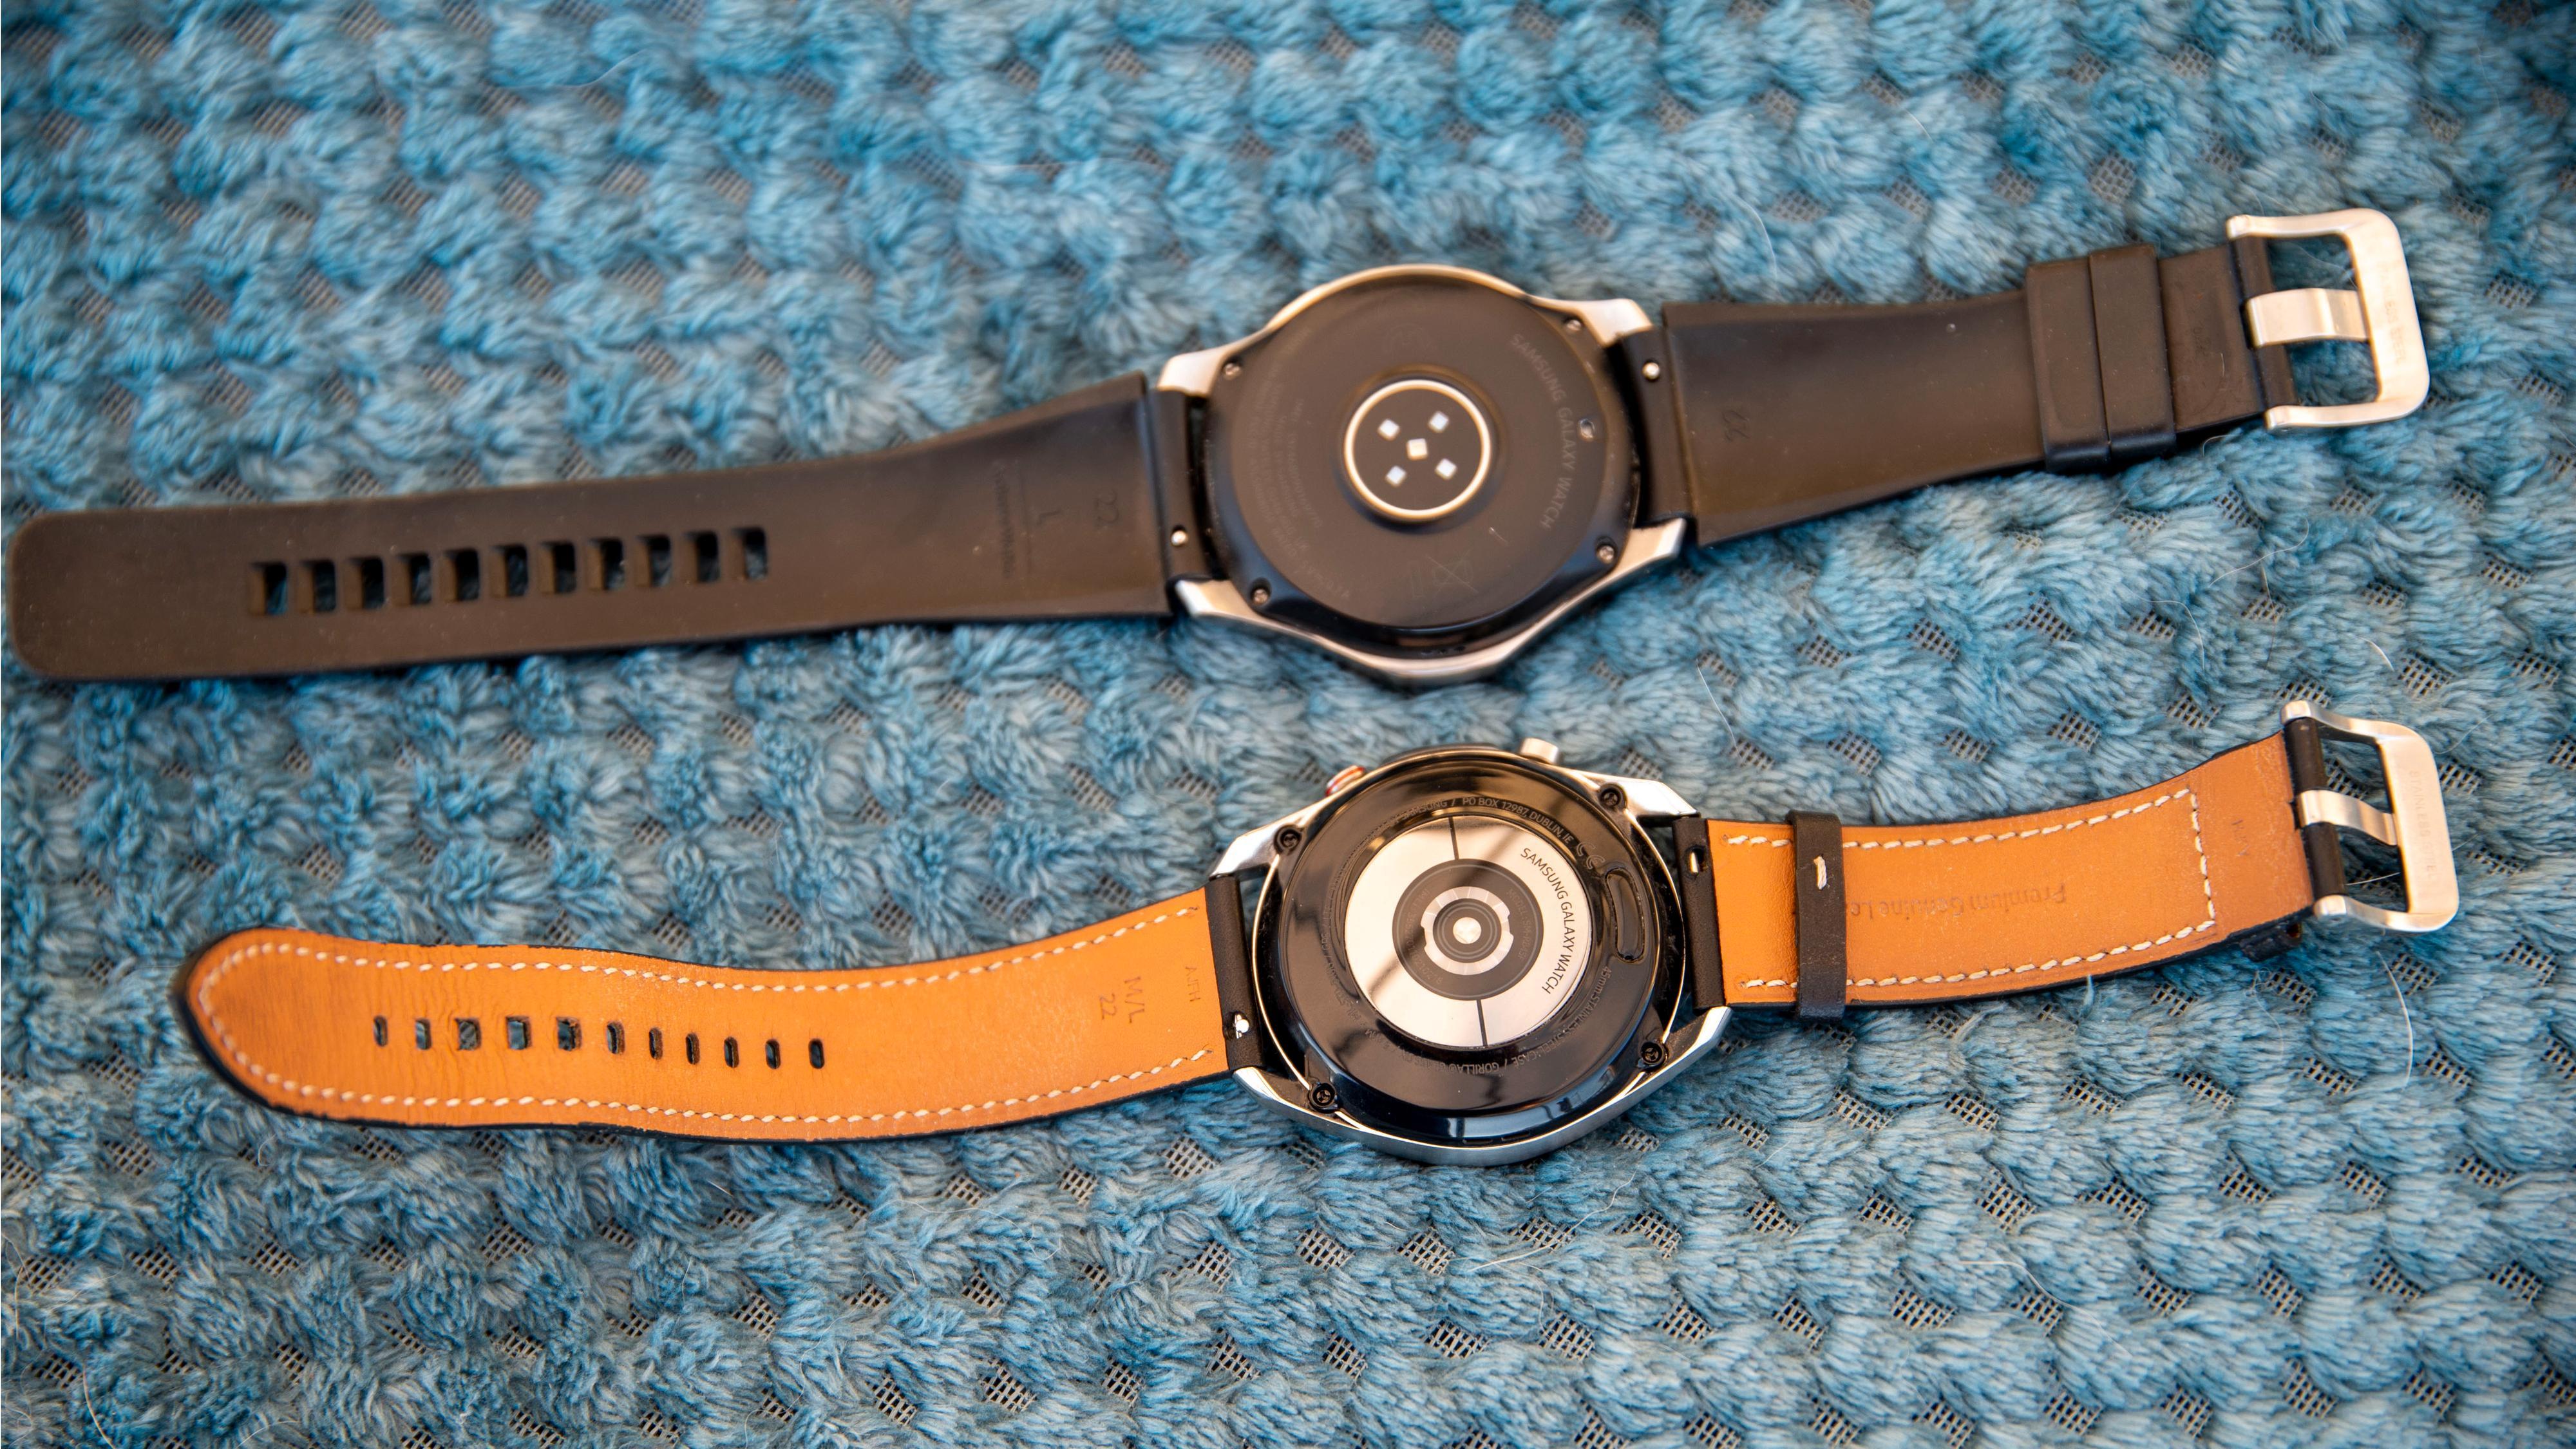 Galaxy Watch 3 (nederst) har fått bedre og mer presis pulsmåler.